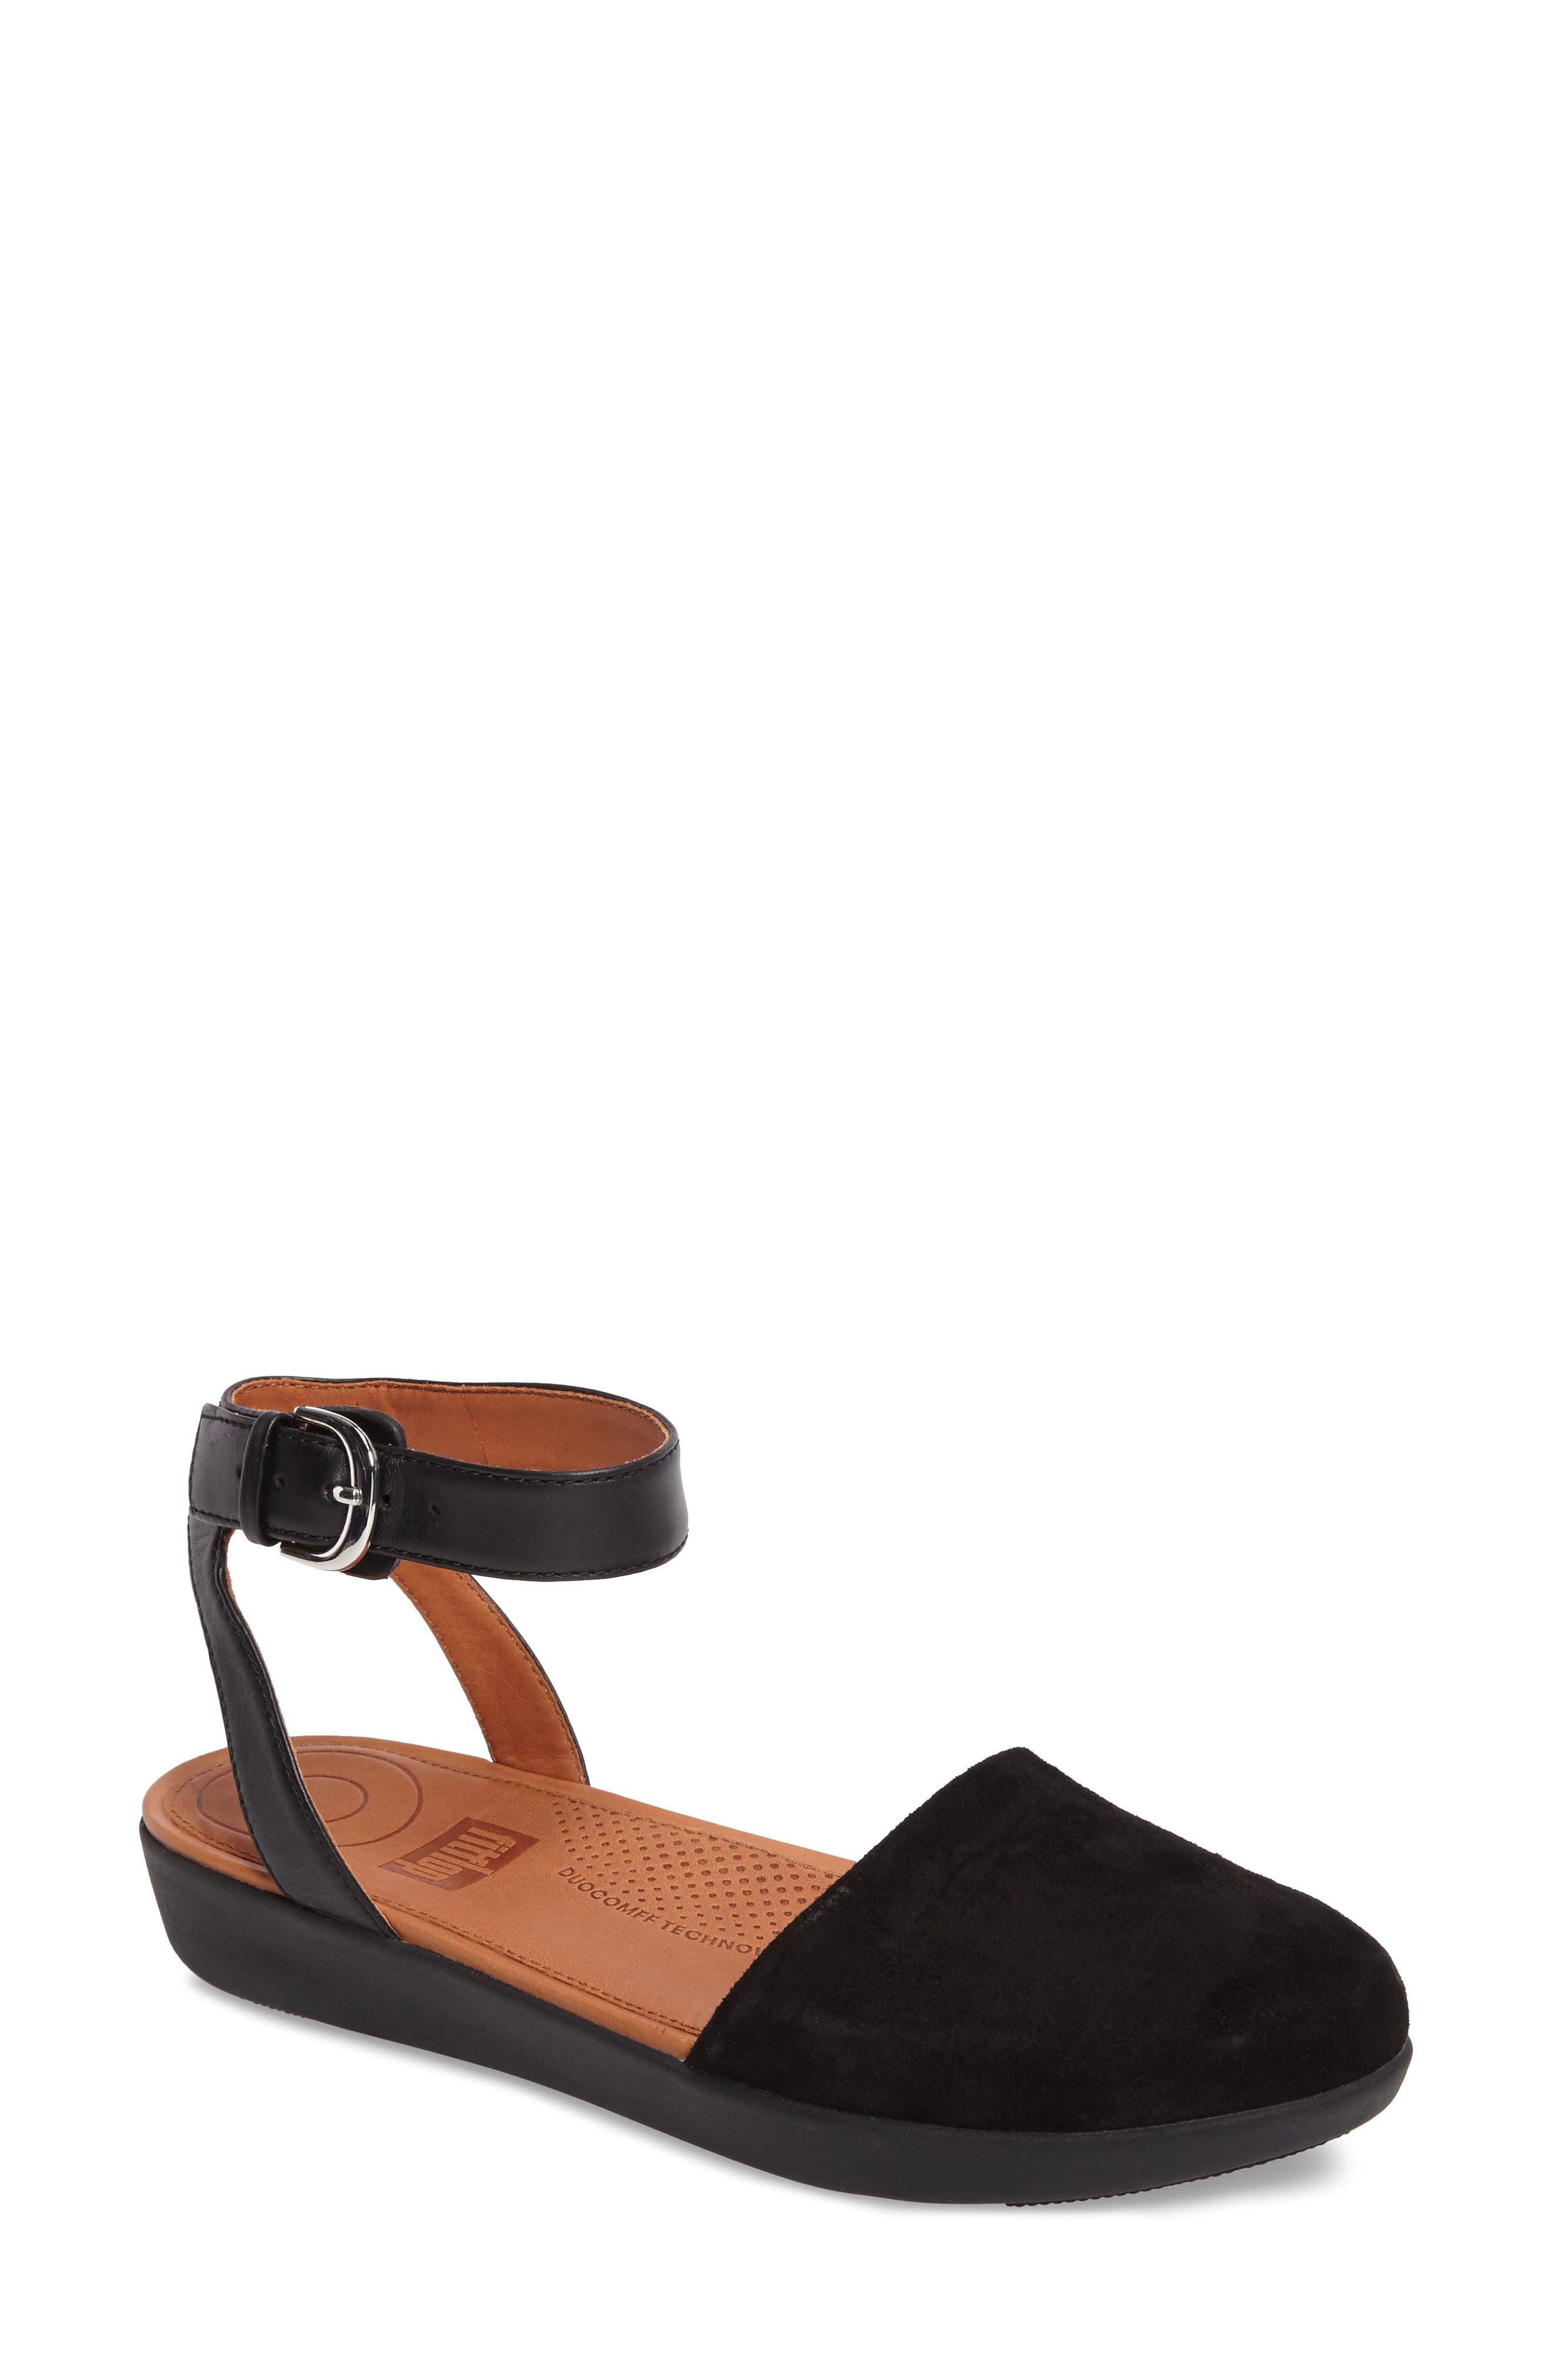 Cova Ankle Strap Sandal,                             Main thumbnail 1, color,                             001